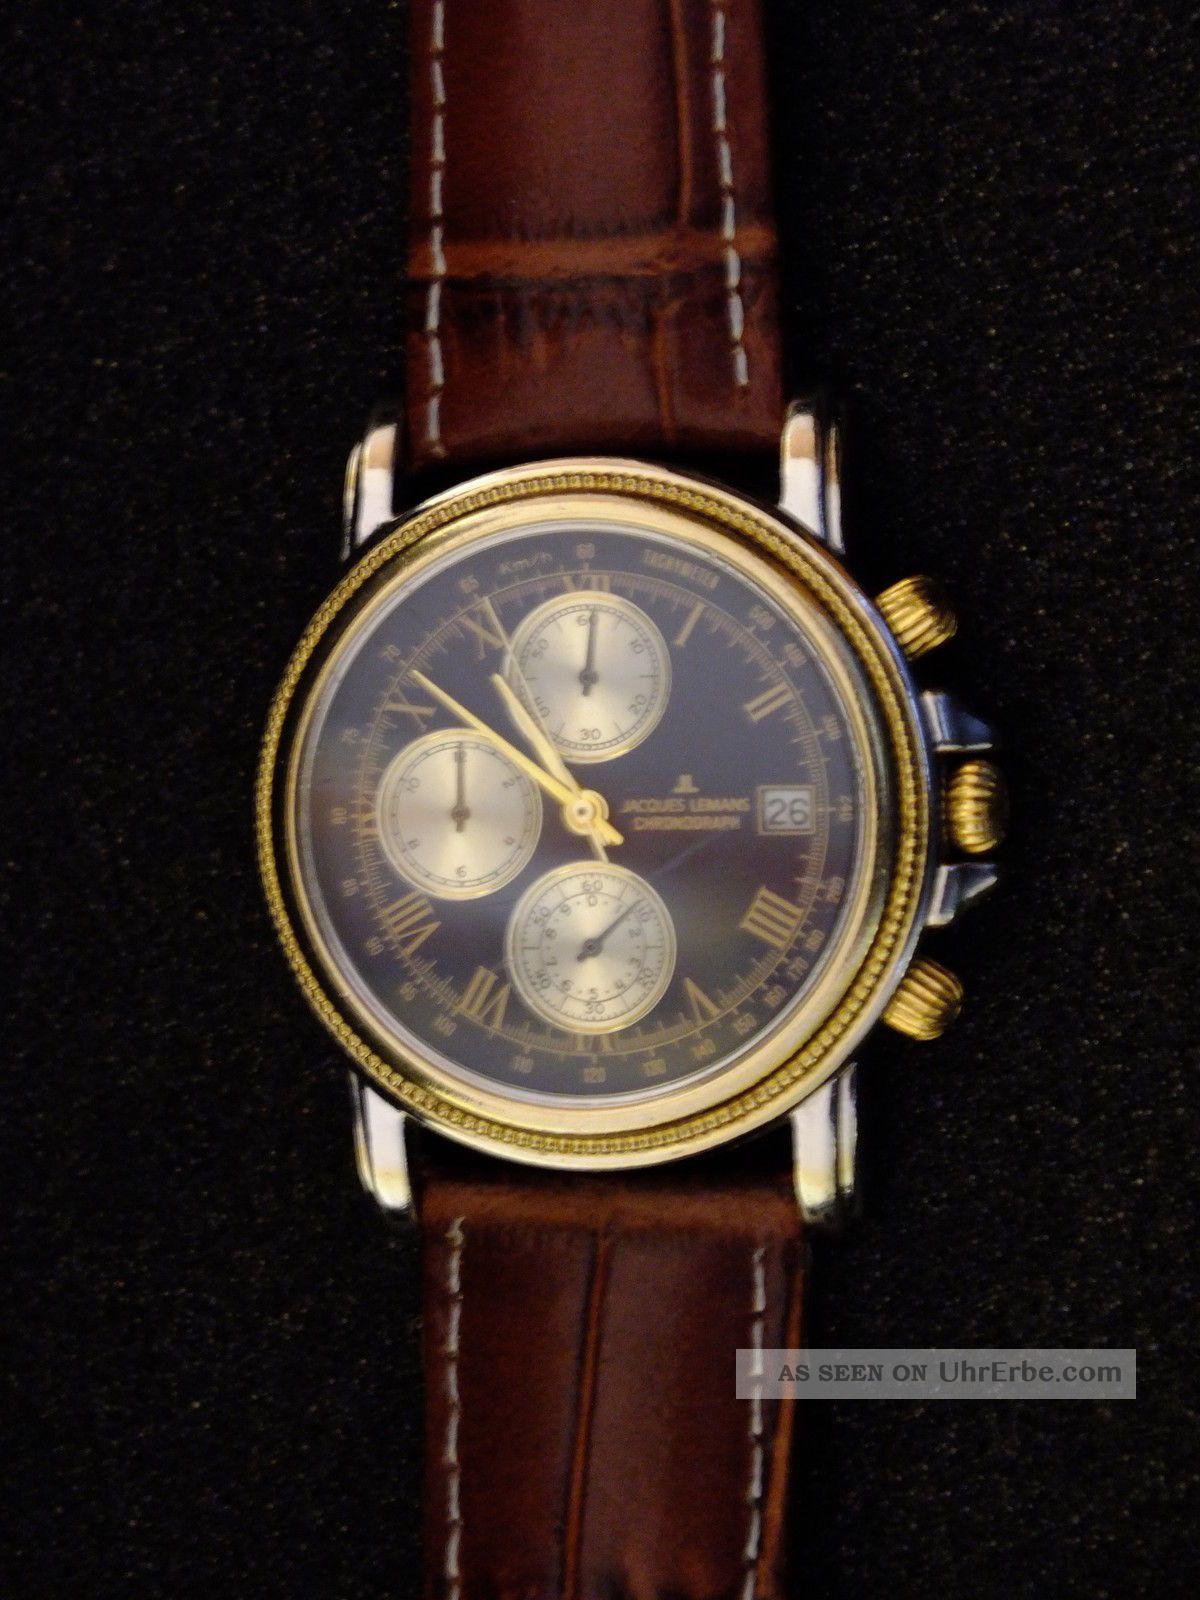 Jasques Lemans Chronograph Armbanduhren Bild